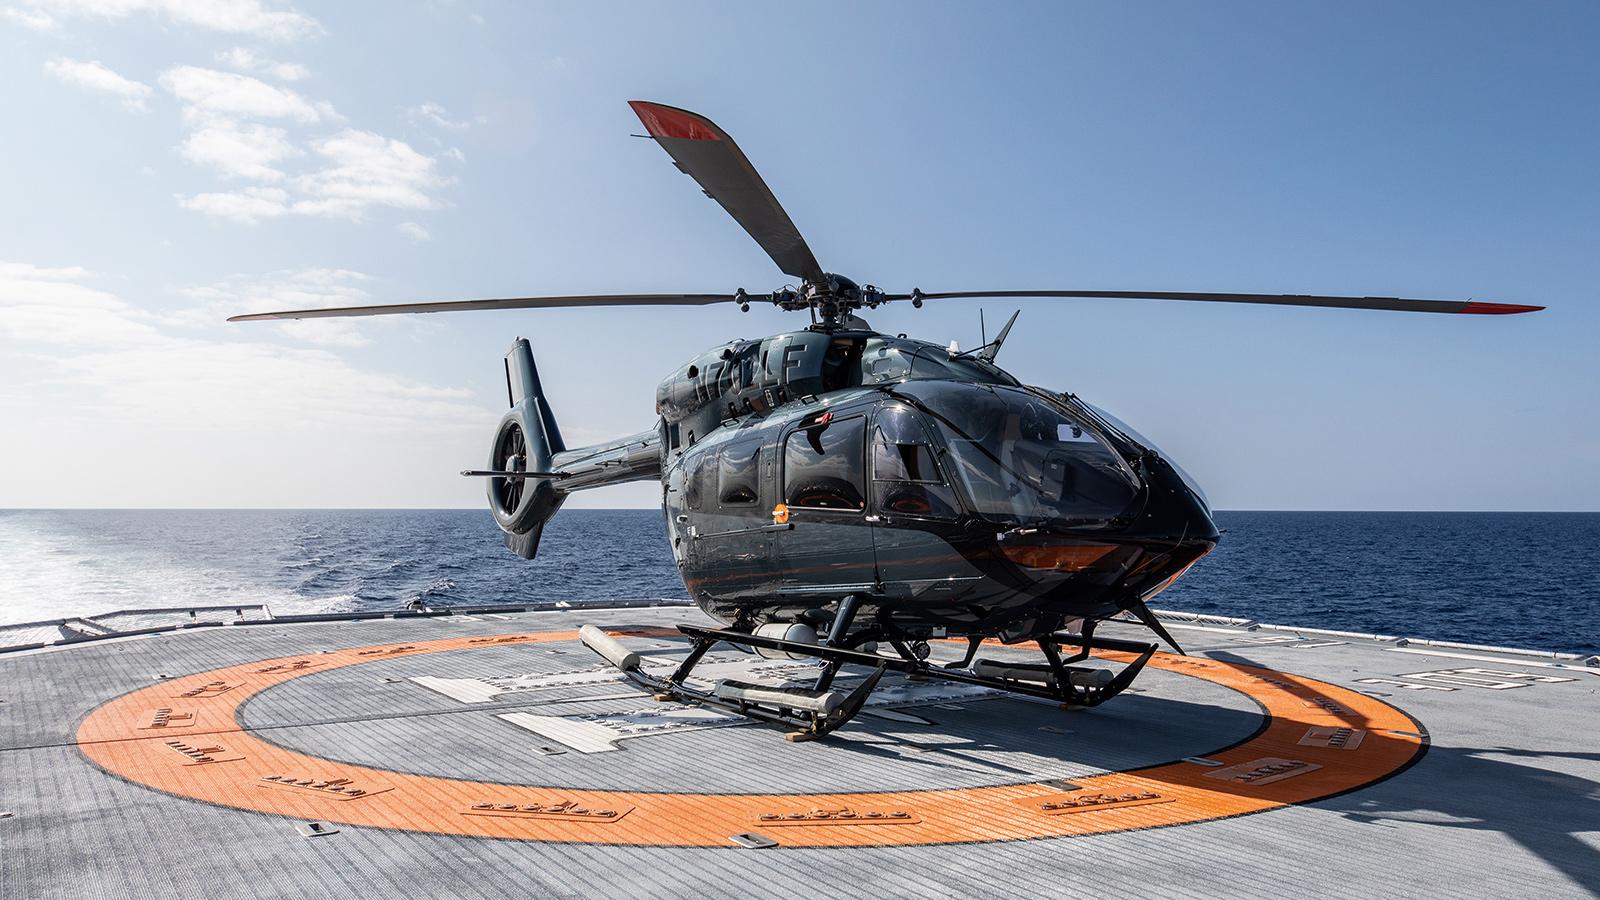 catamaran-superyacht-Hodor-worlds-largest-toybox-helicopter-helipad